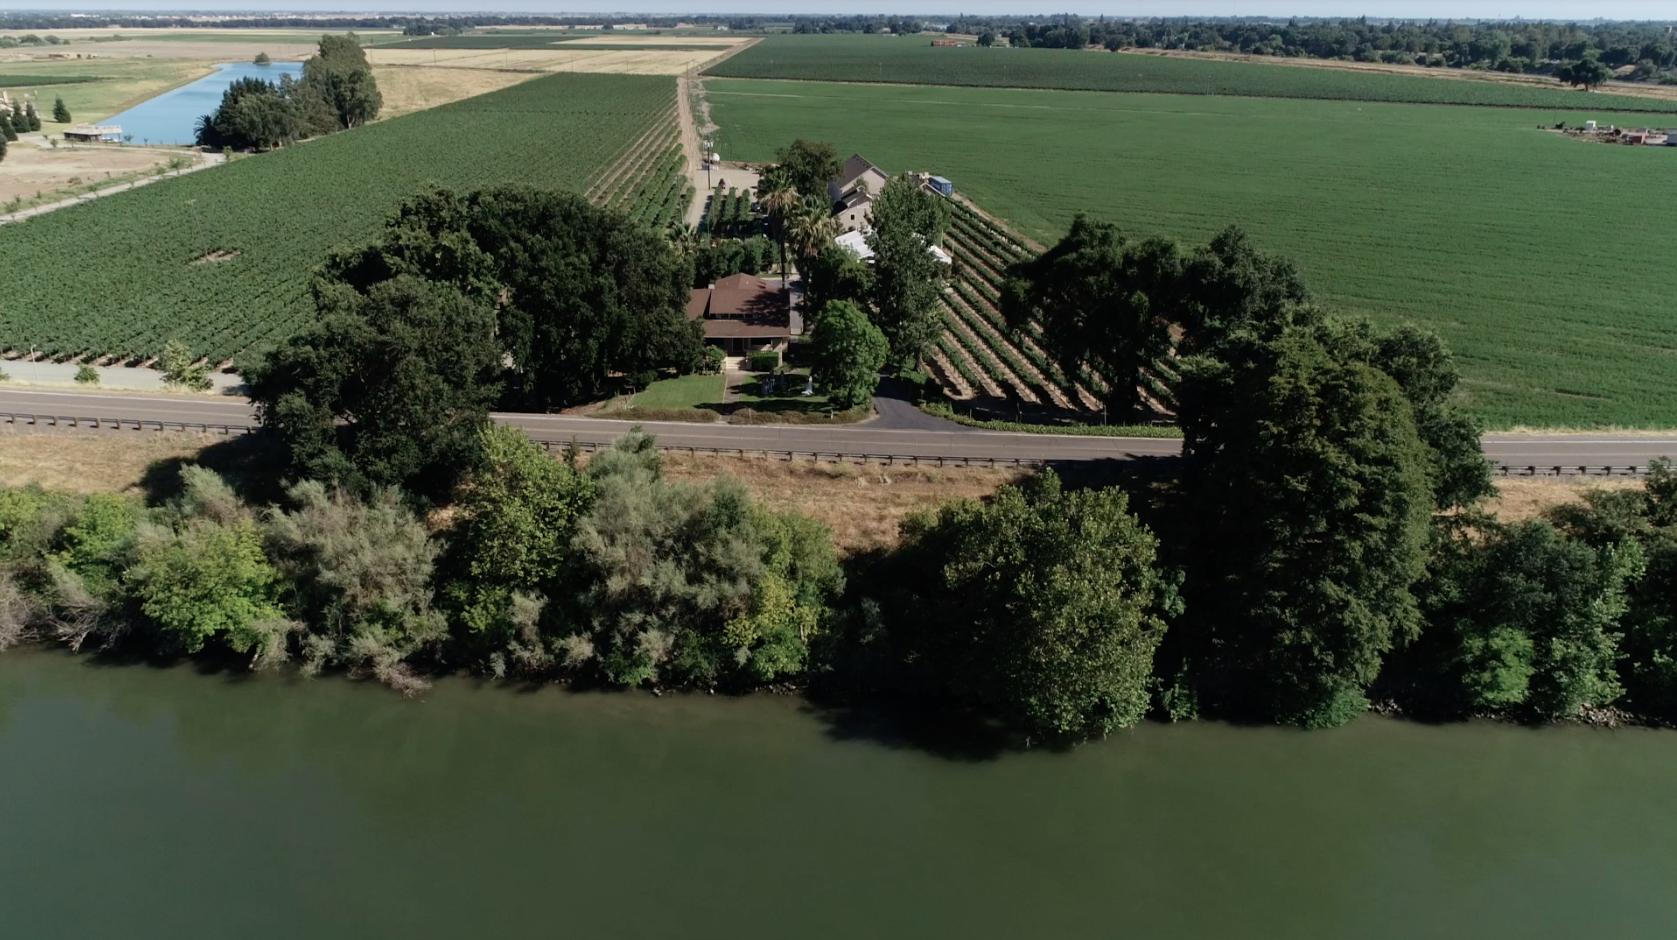 Drone Photo of Scribner Vineyard